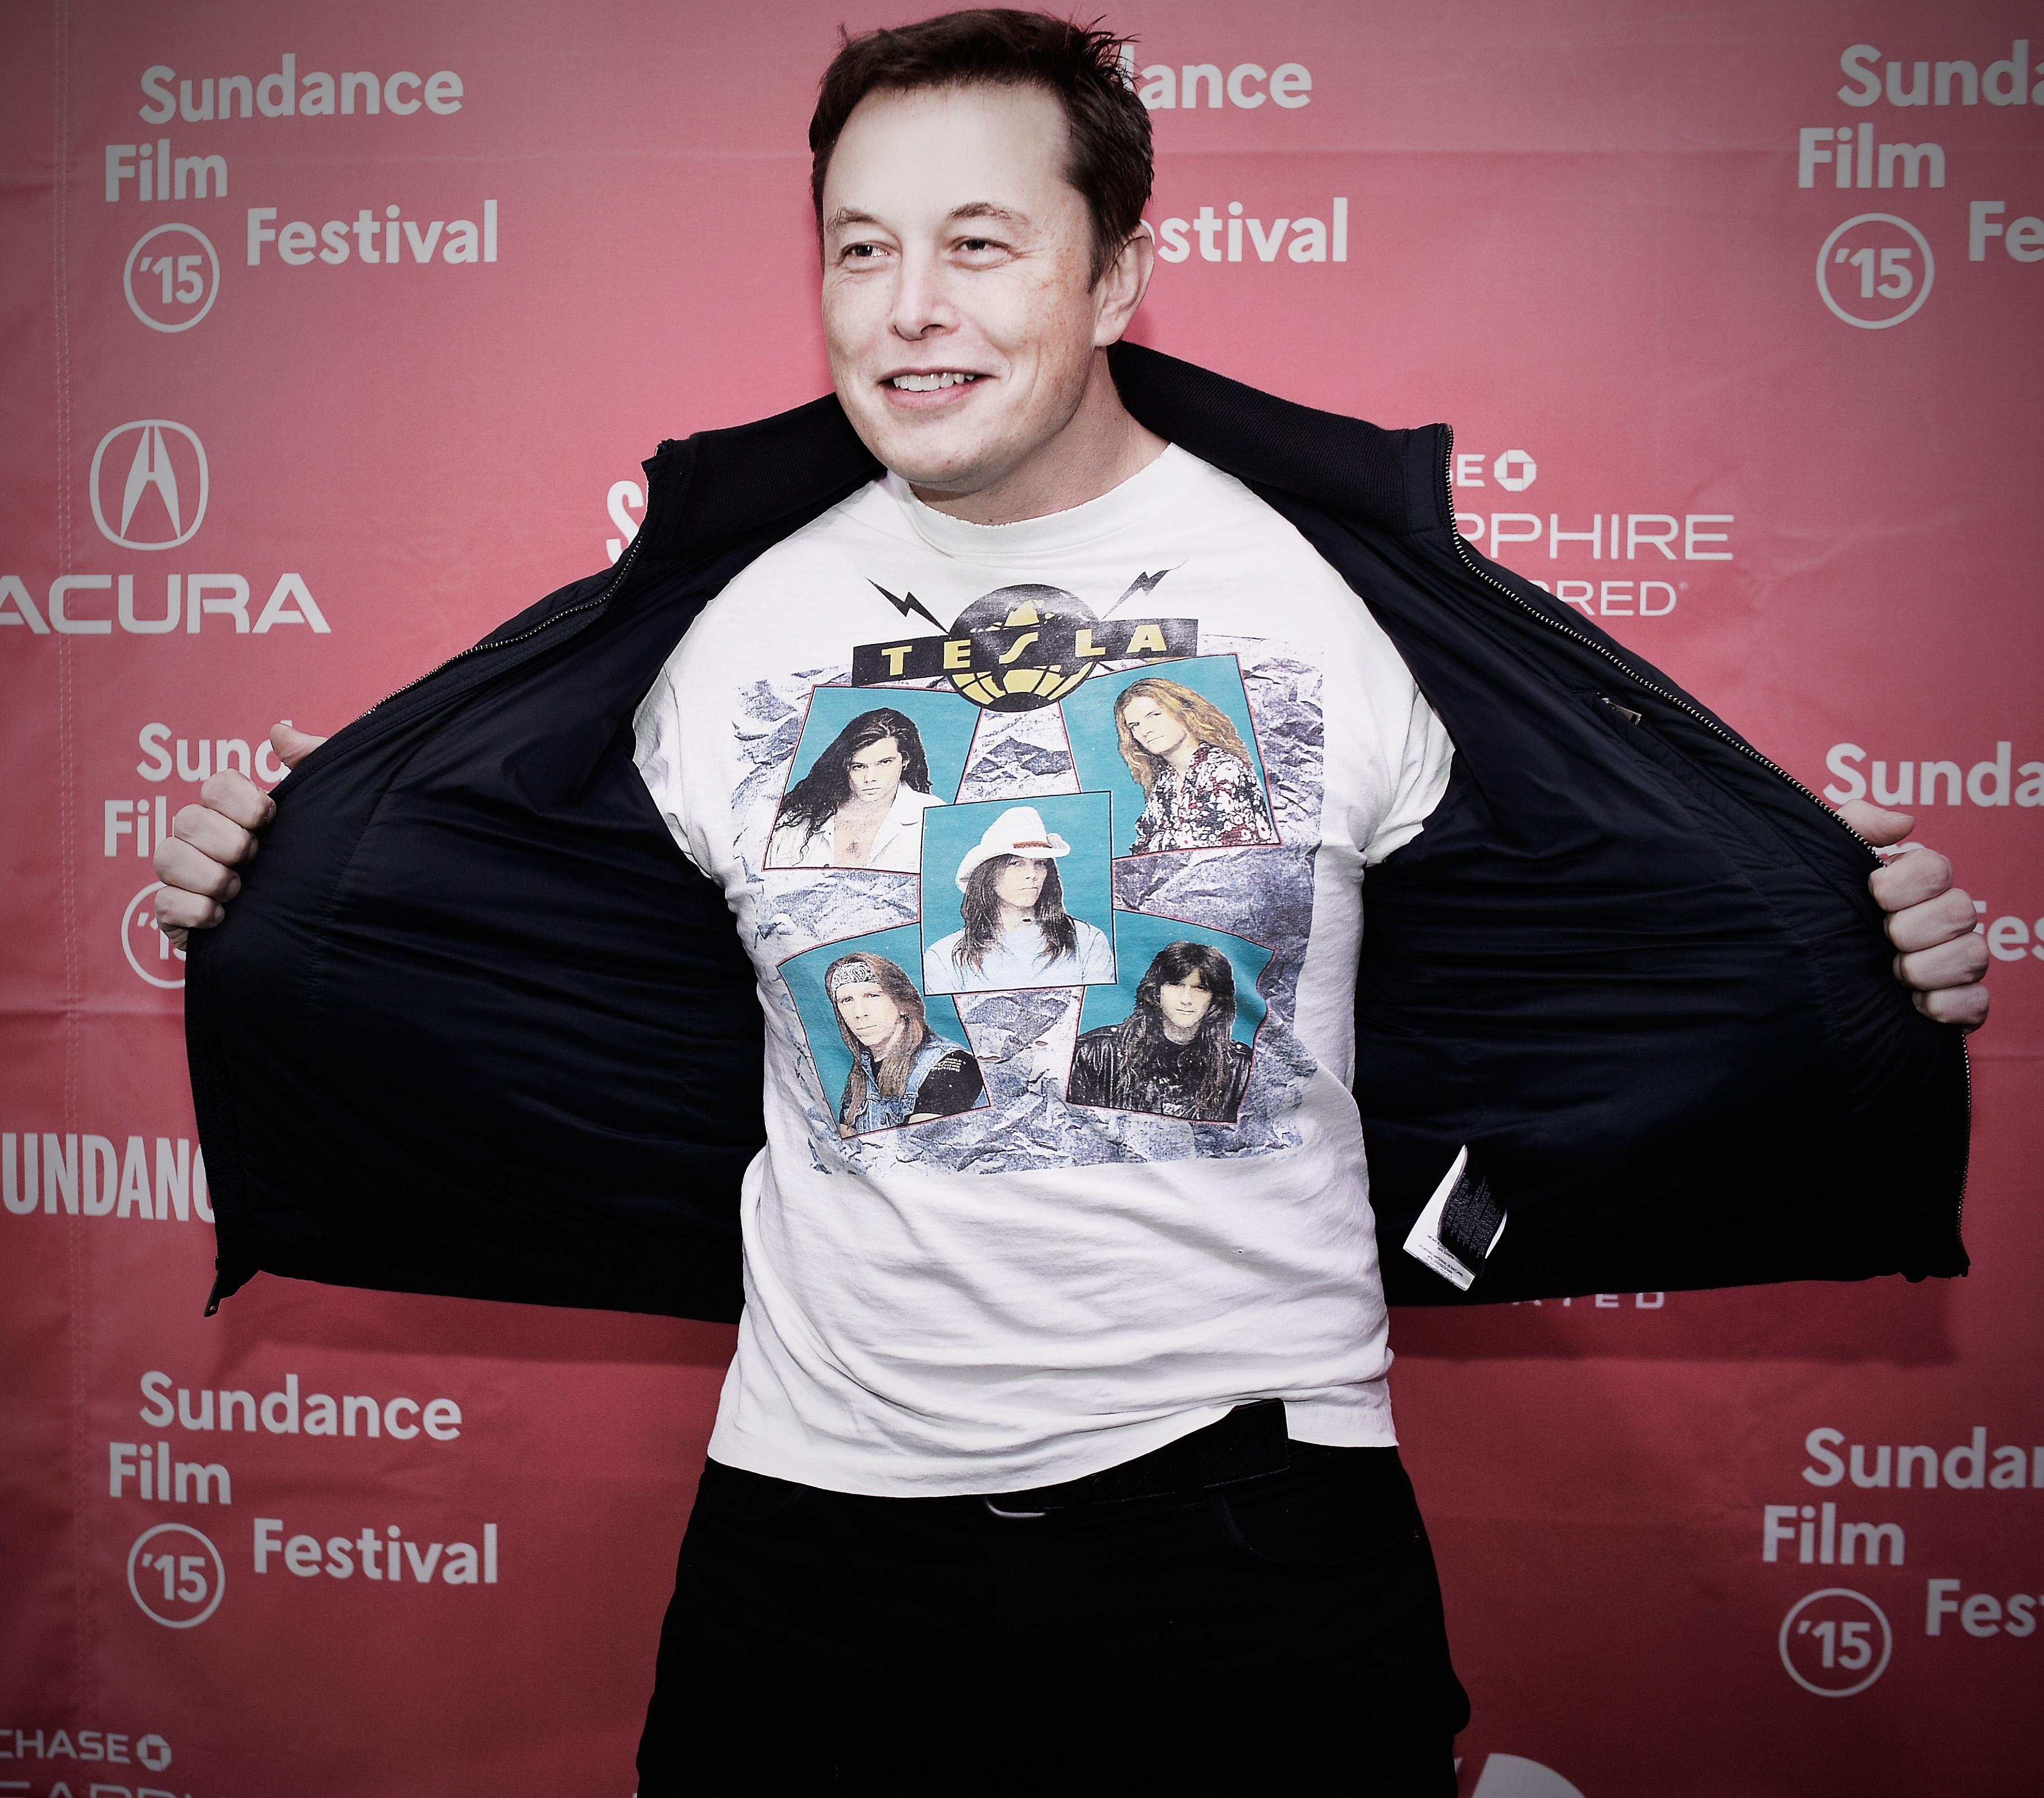 Elon Musk at SXSW